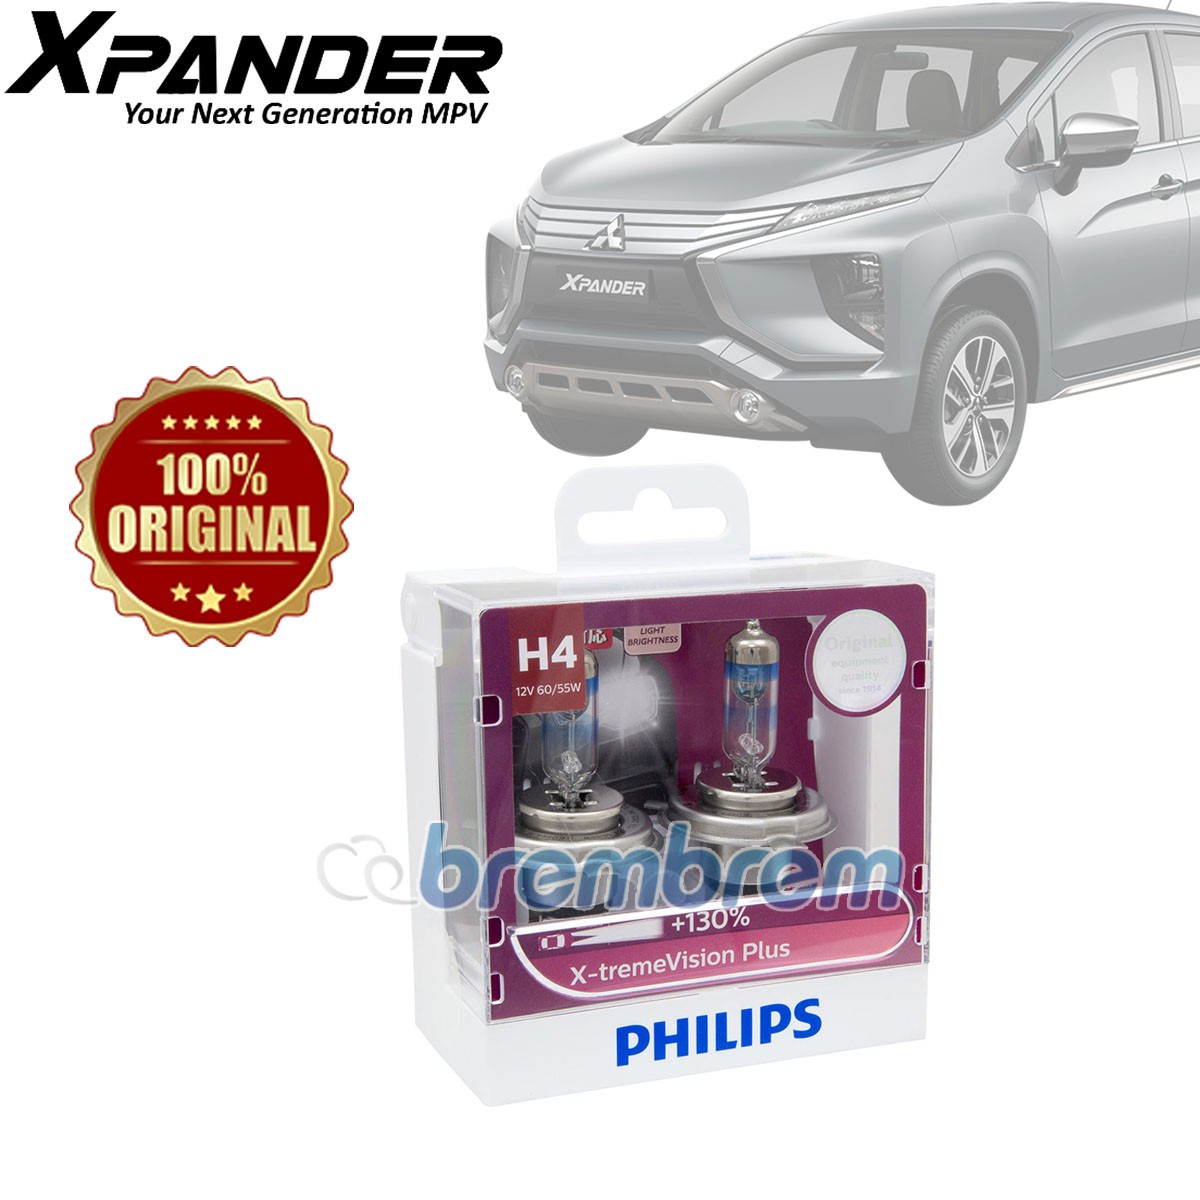 PHILIPS XTREME VISION PLUS H4 (3700K) - LAMPU HALOGEN MITSUBISHI XPANDER